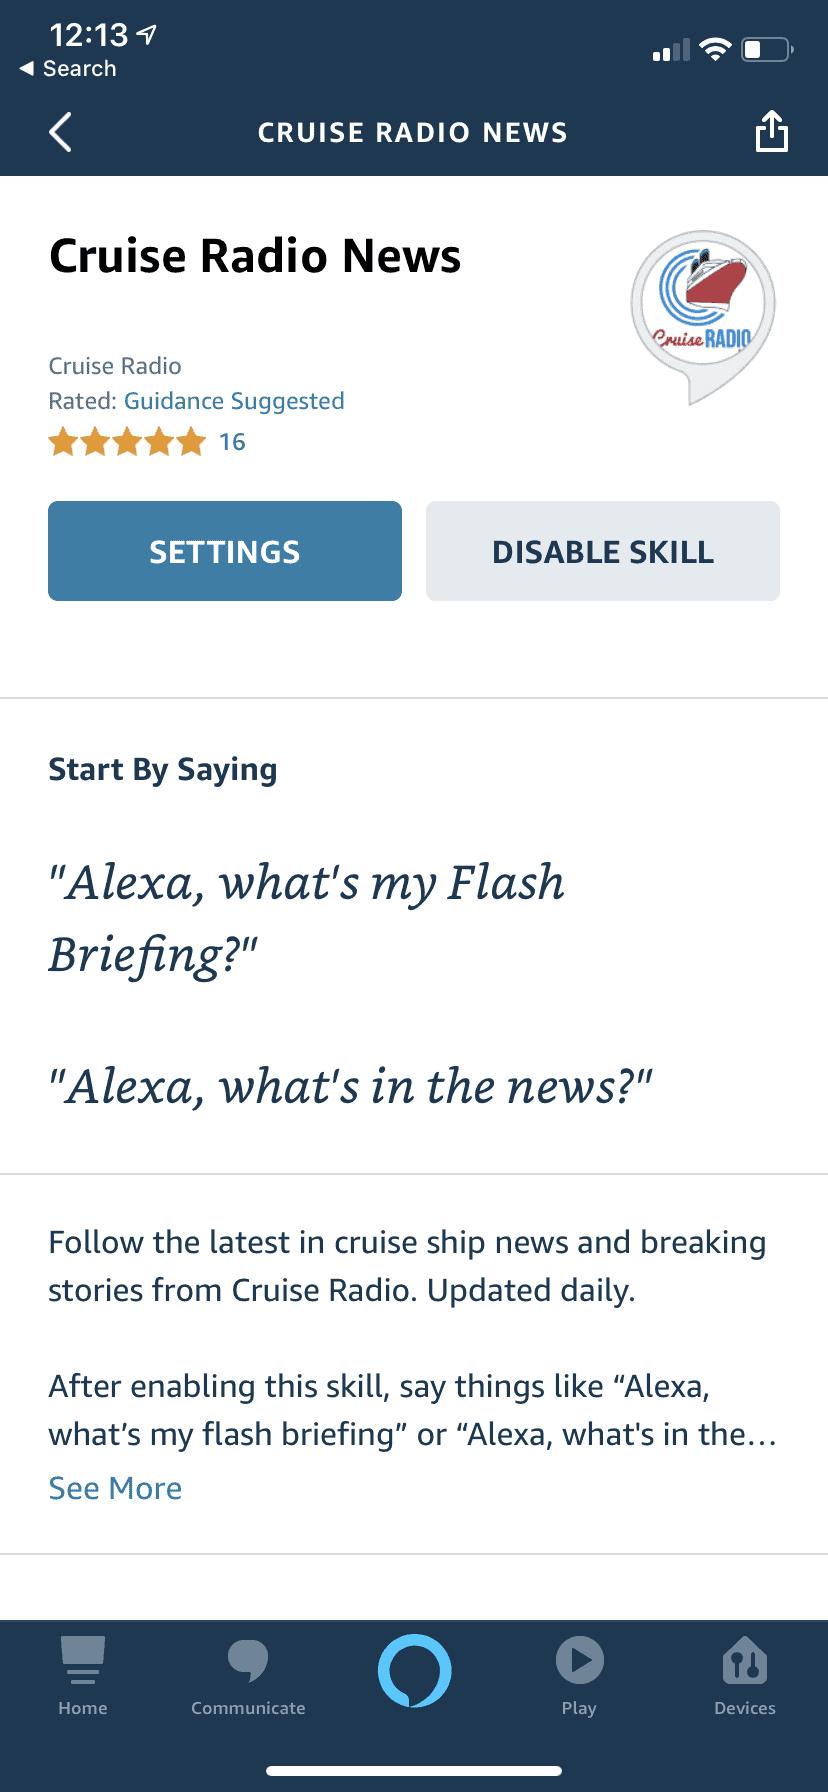 New Cruise Radio Daily News Podcast Enhances Listener Experience